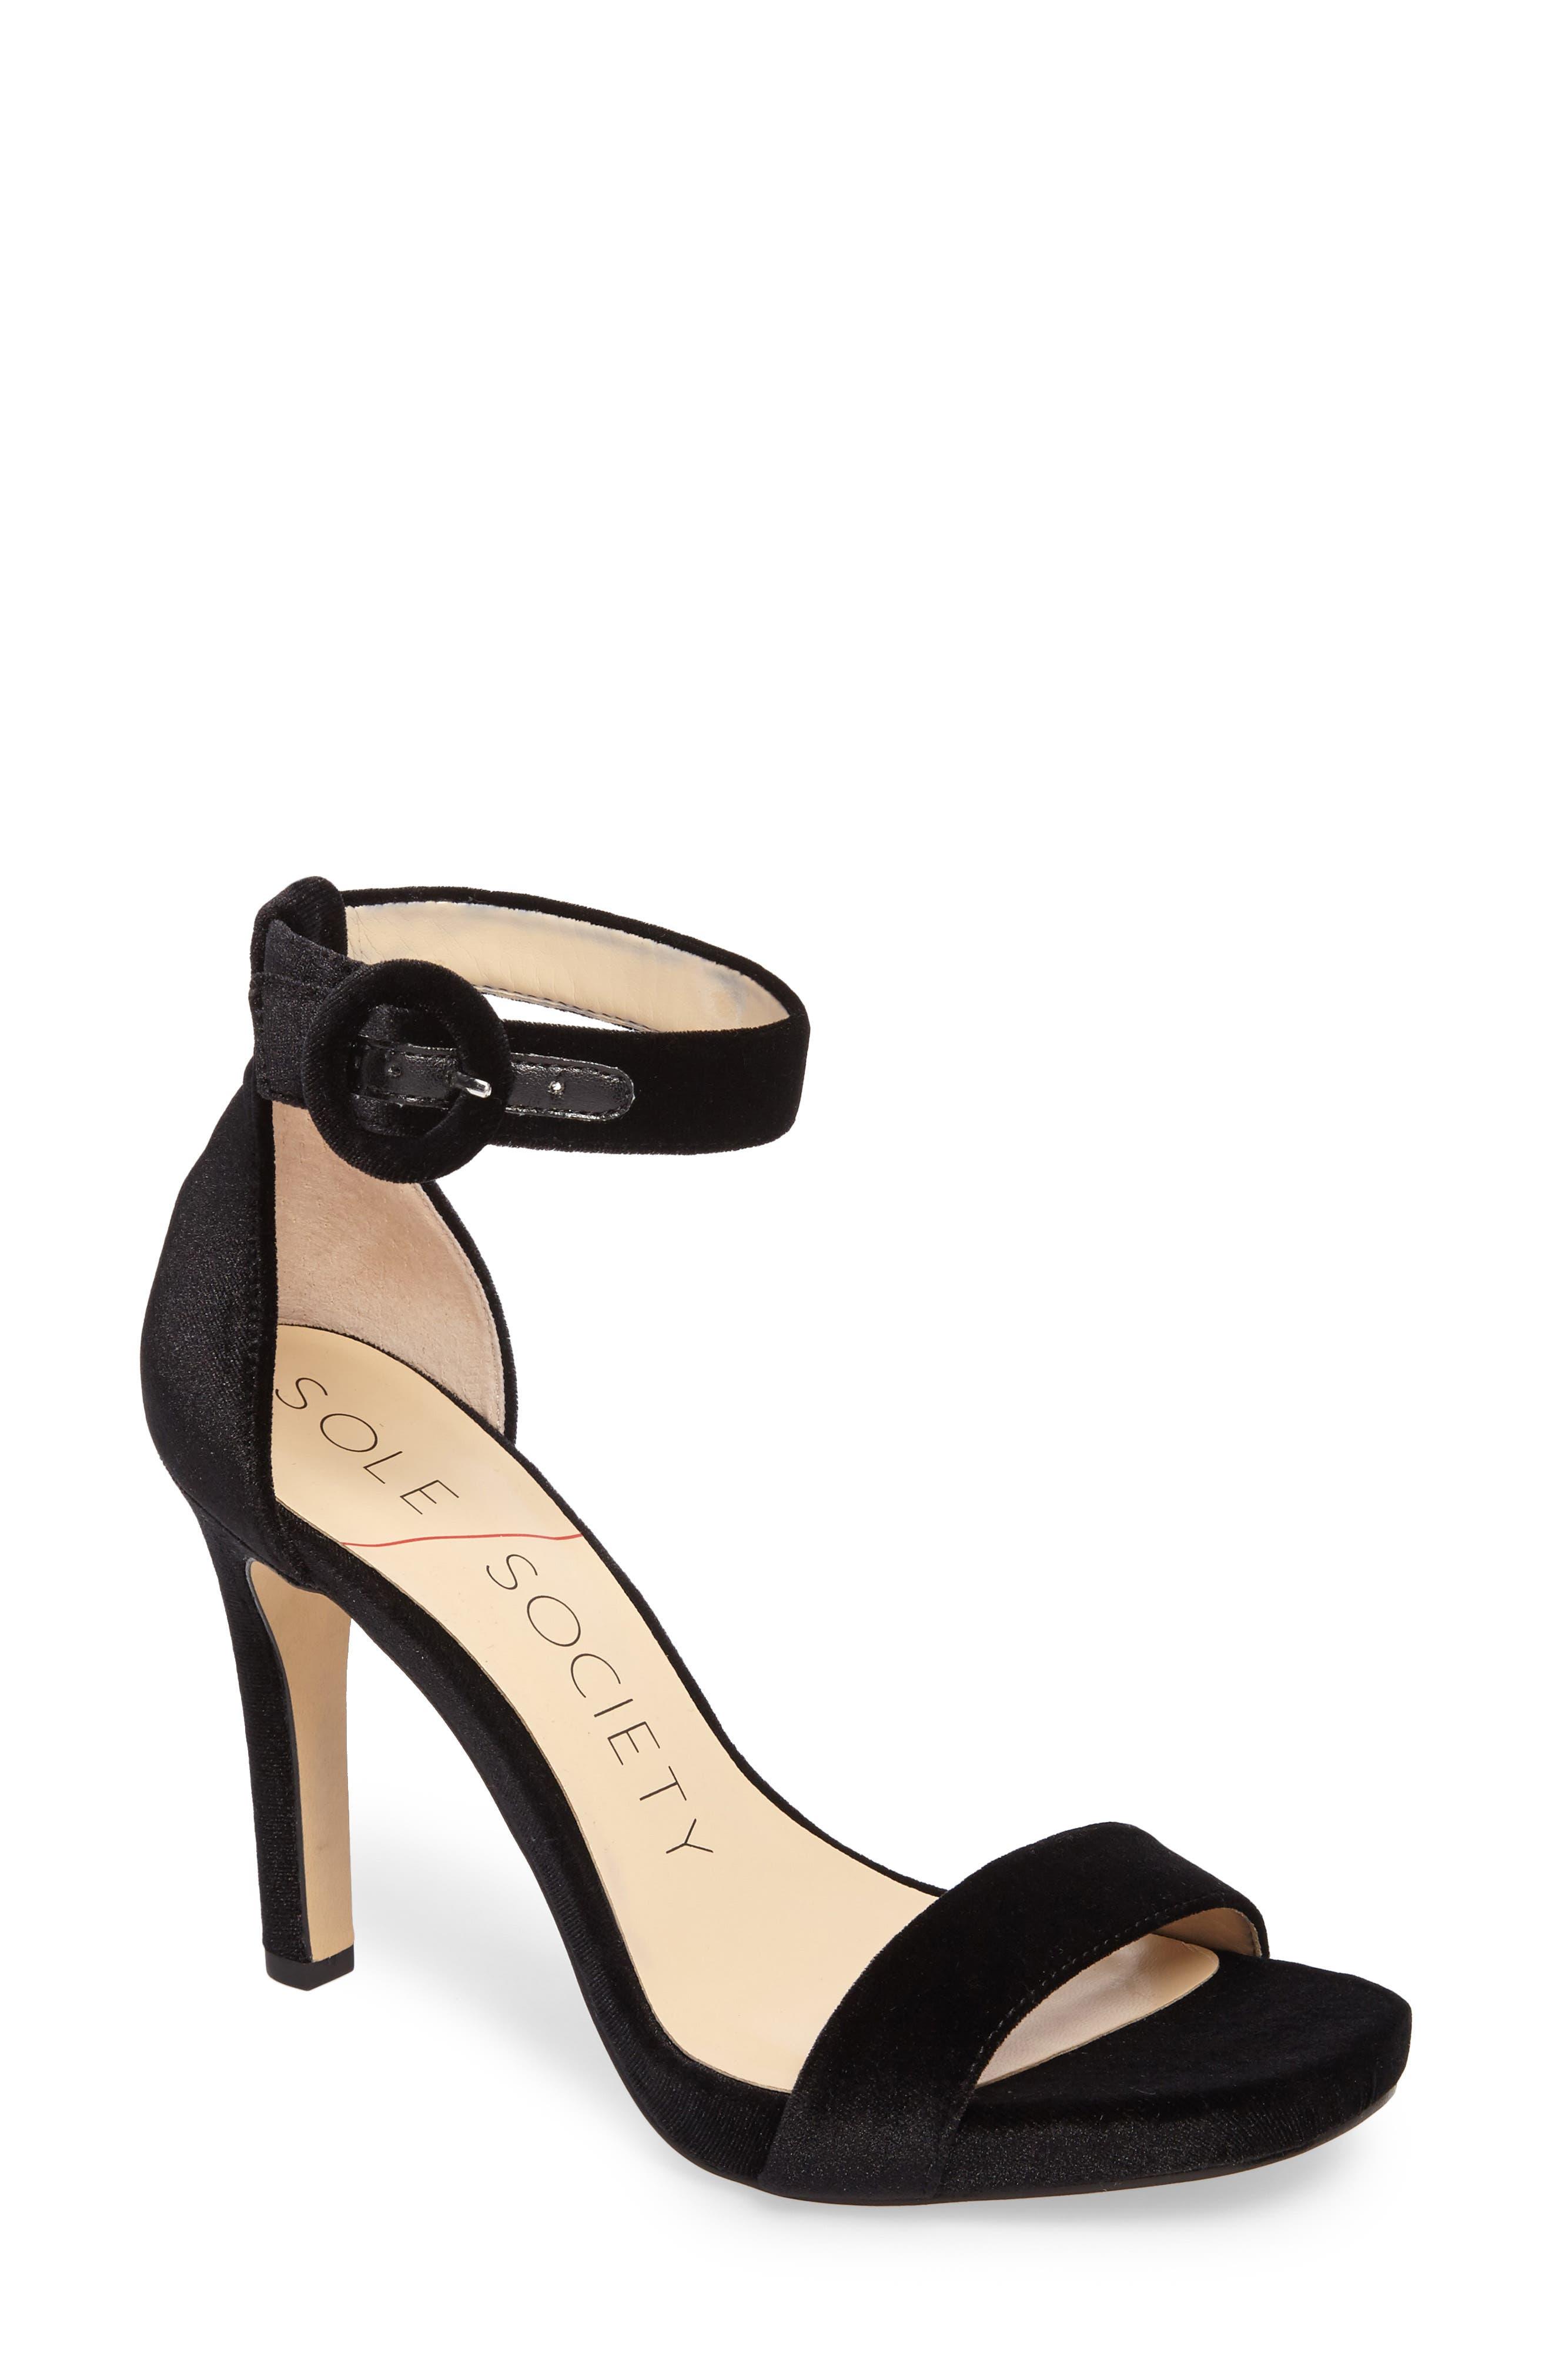 Emelia Ankle Strap Sandal,                         Main,                         color, Black